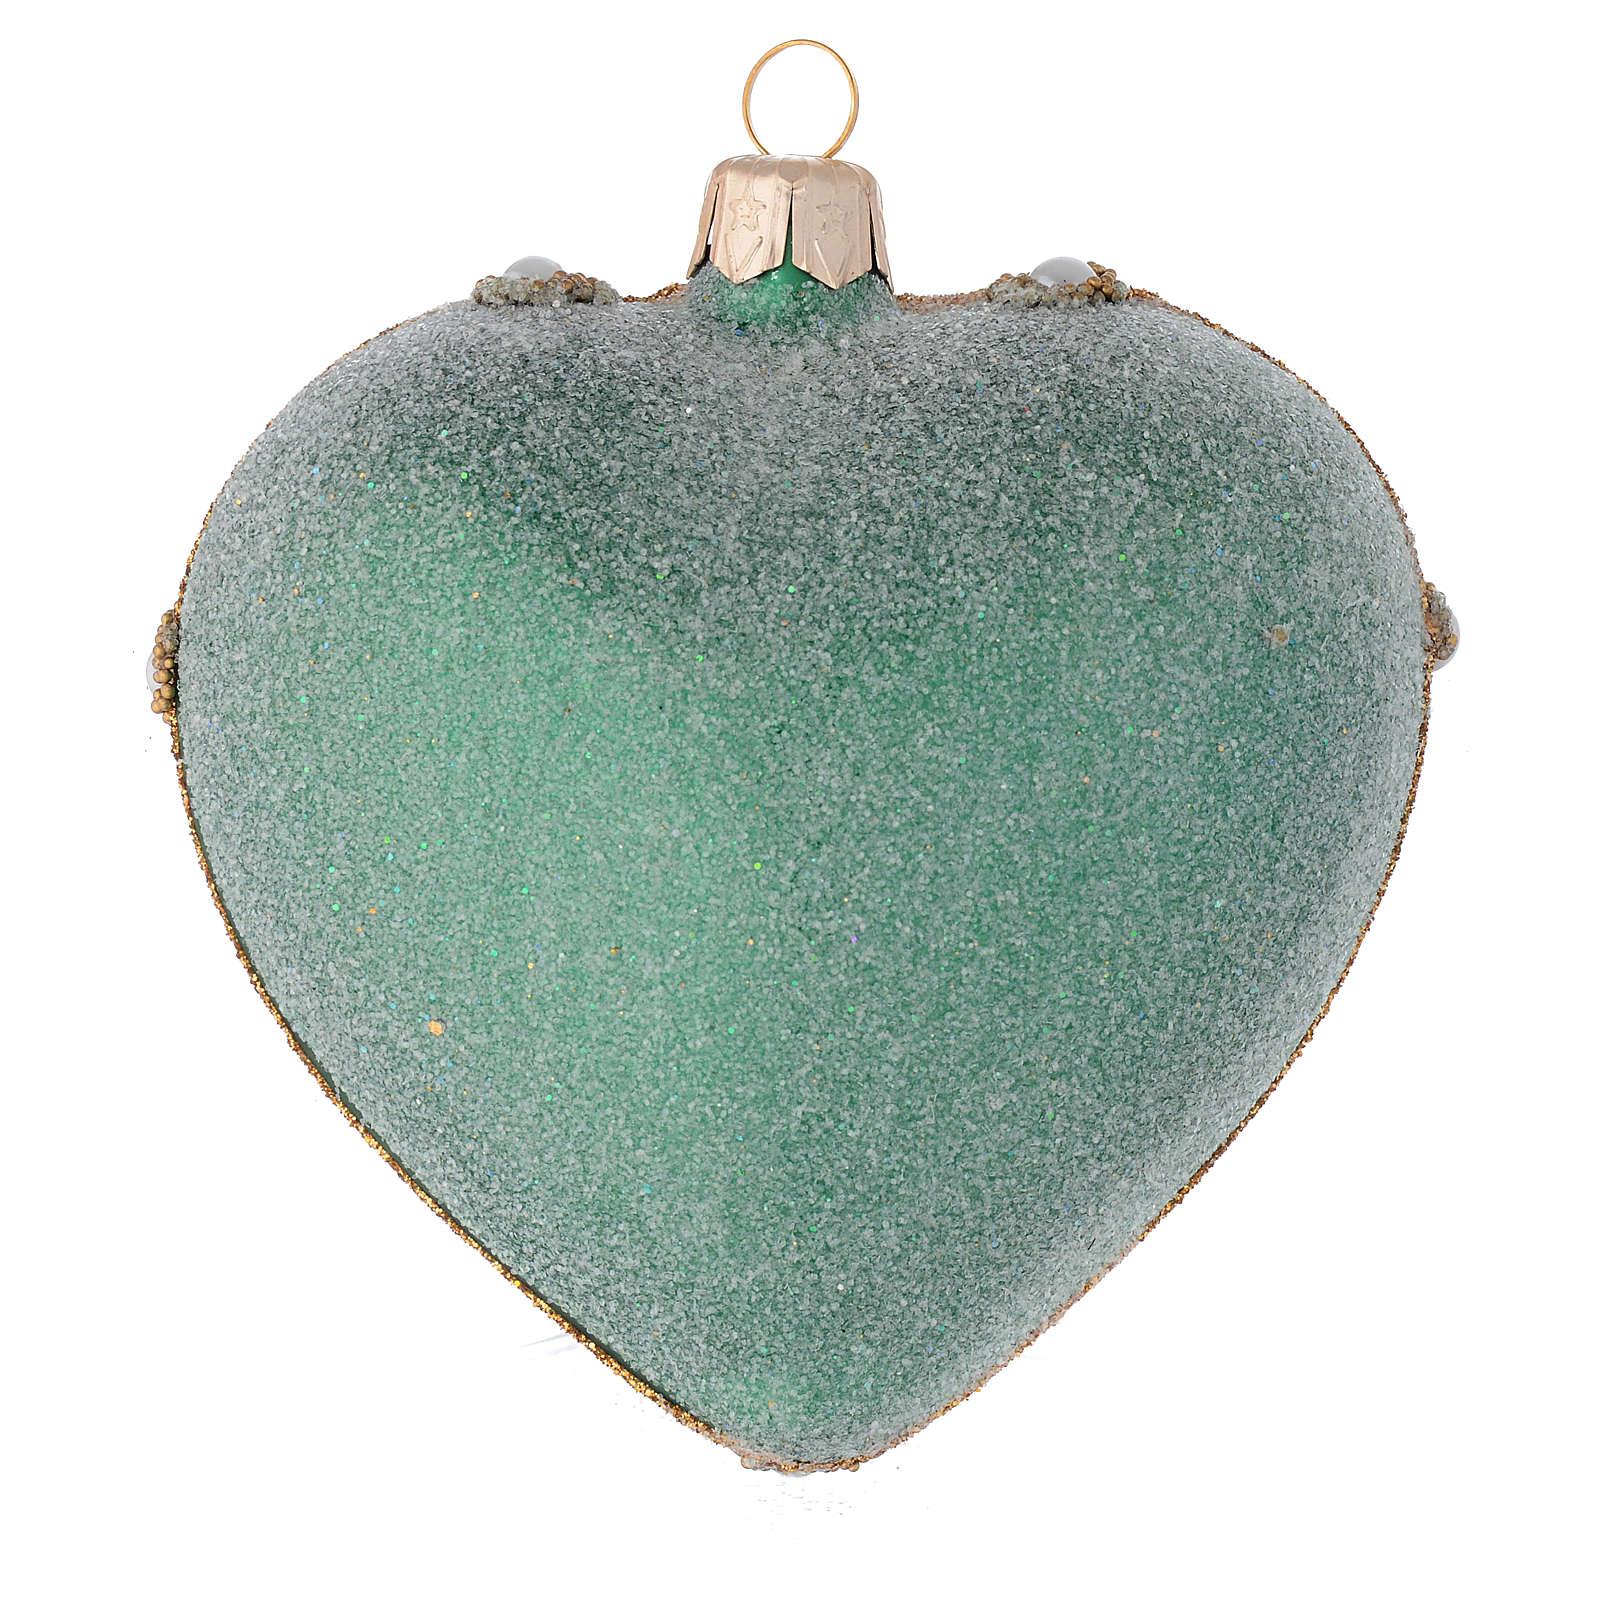 Coeur pour sapin Noël vert et or 100 mm 4